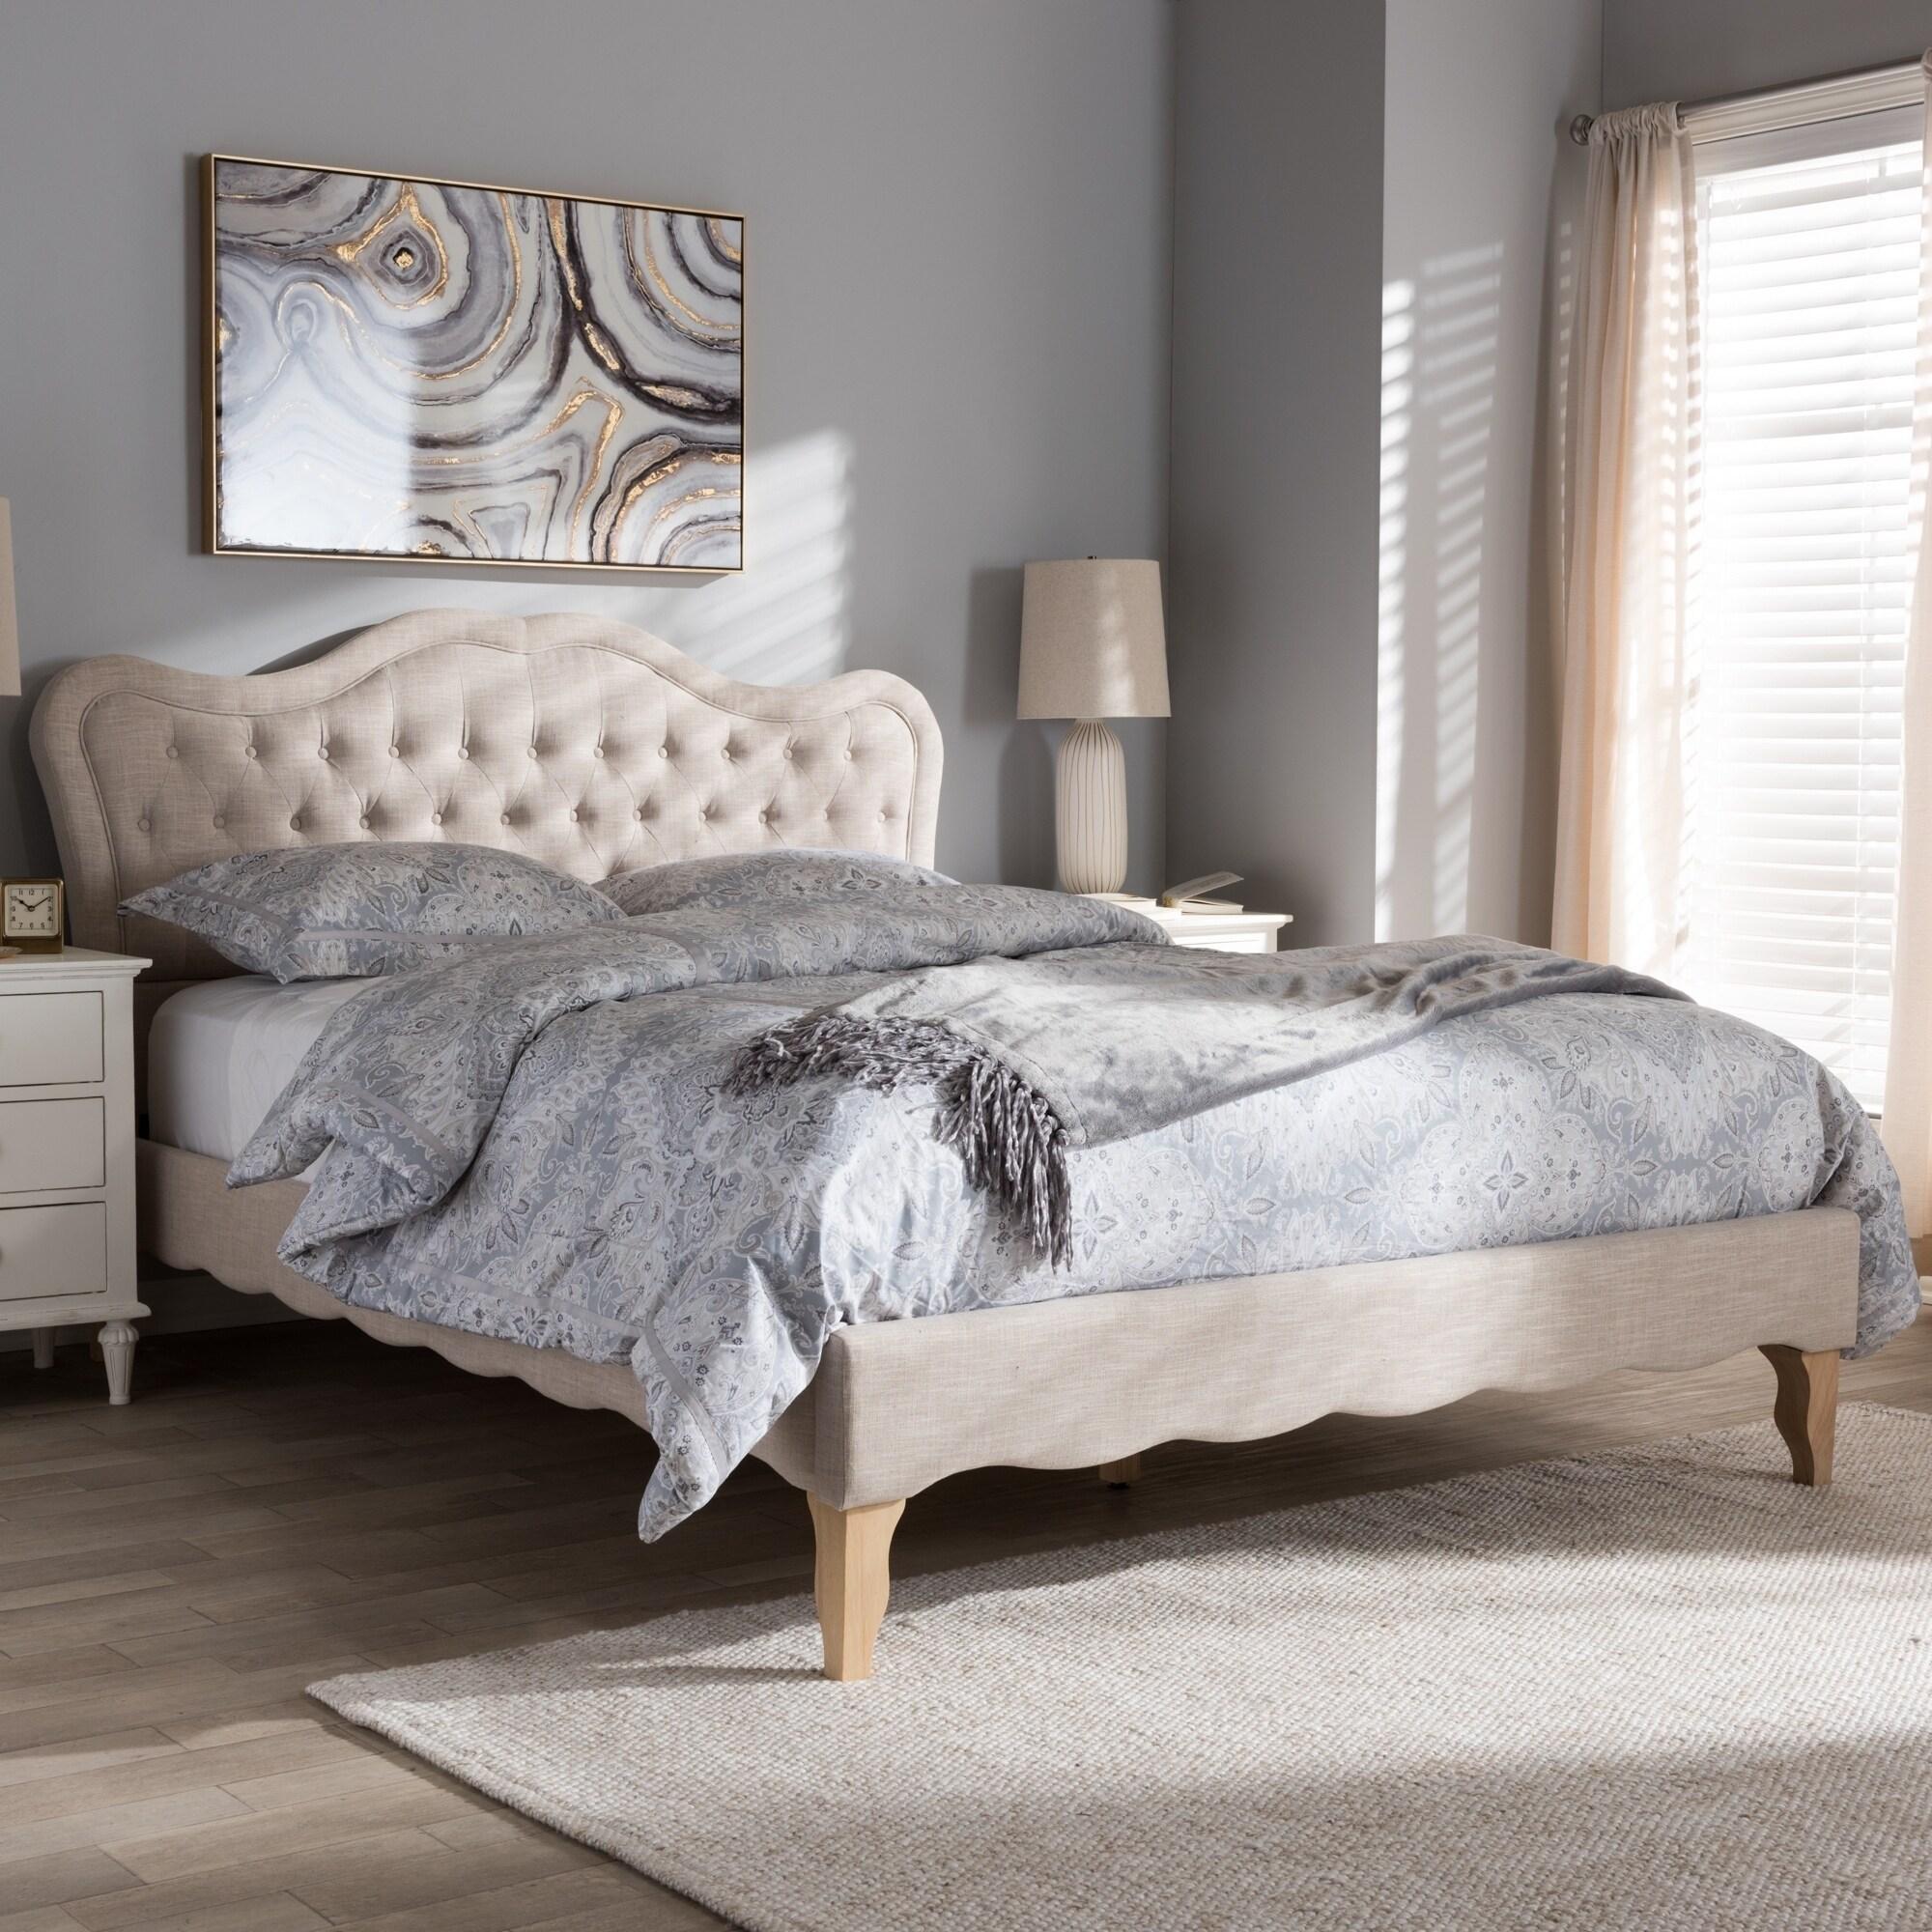 Maison Rouge Thompson French Province Style Fabric Platform Bed